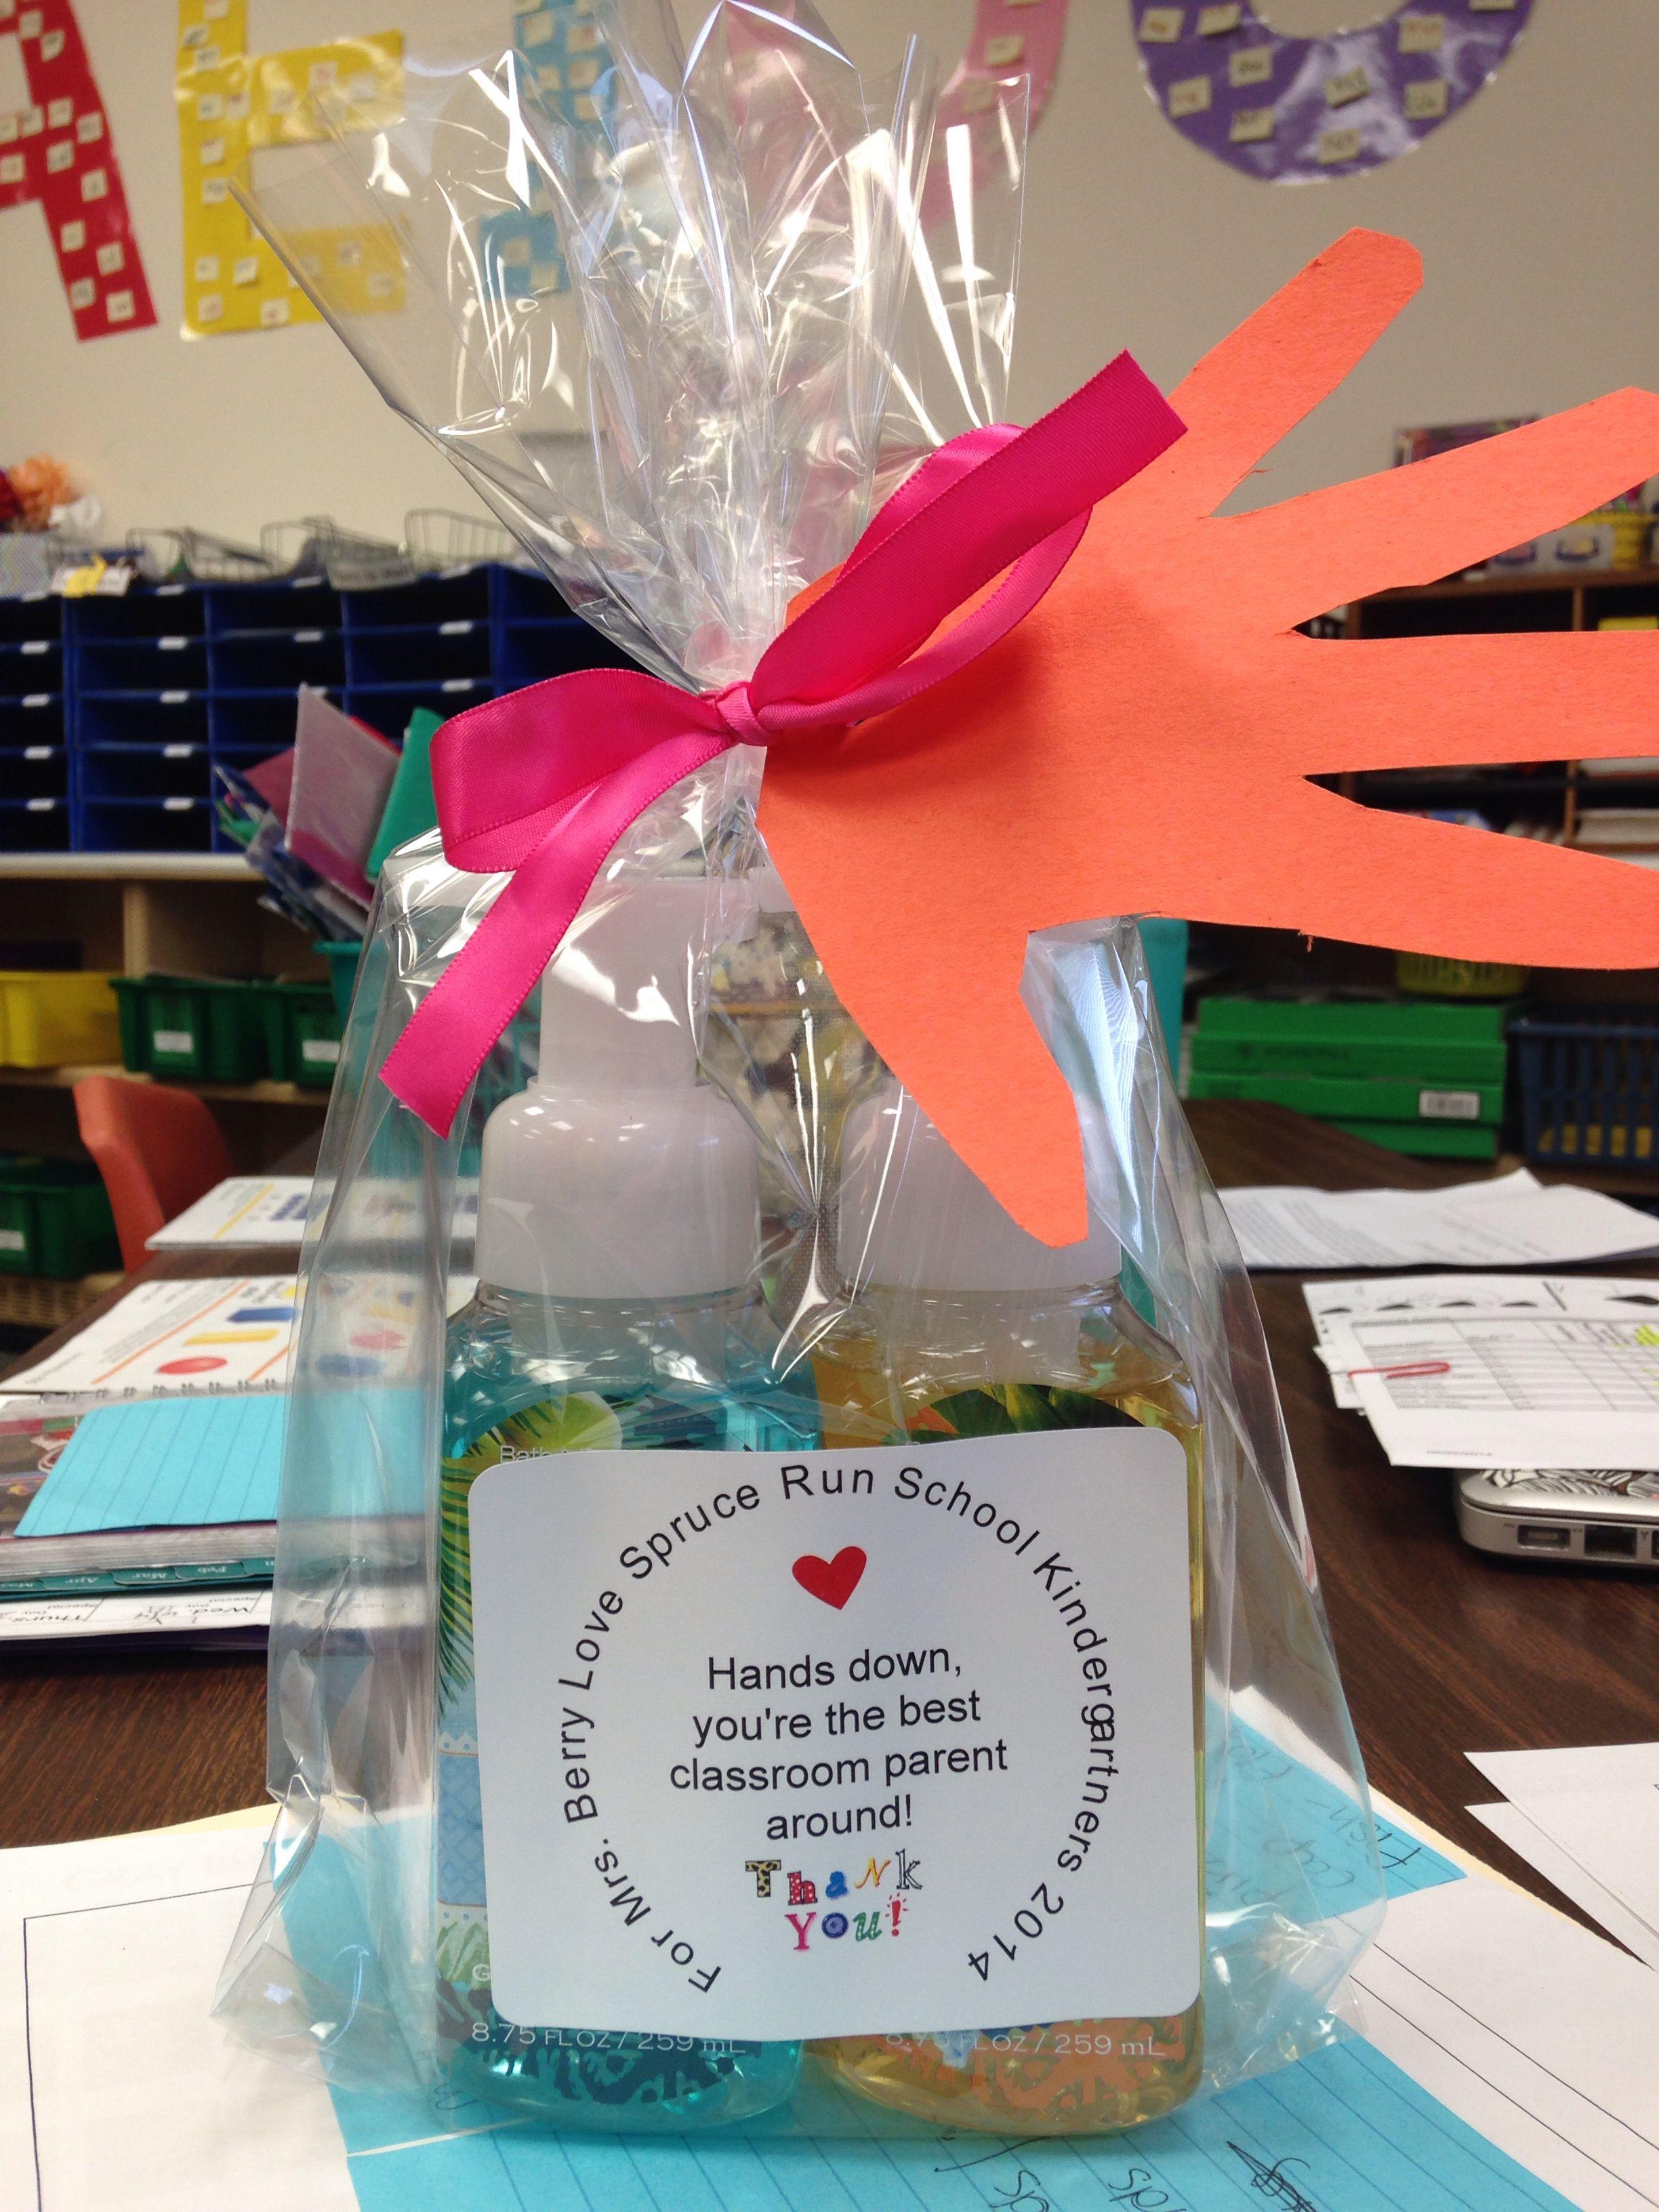 Home room parent gift hands down best classroom parent